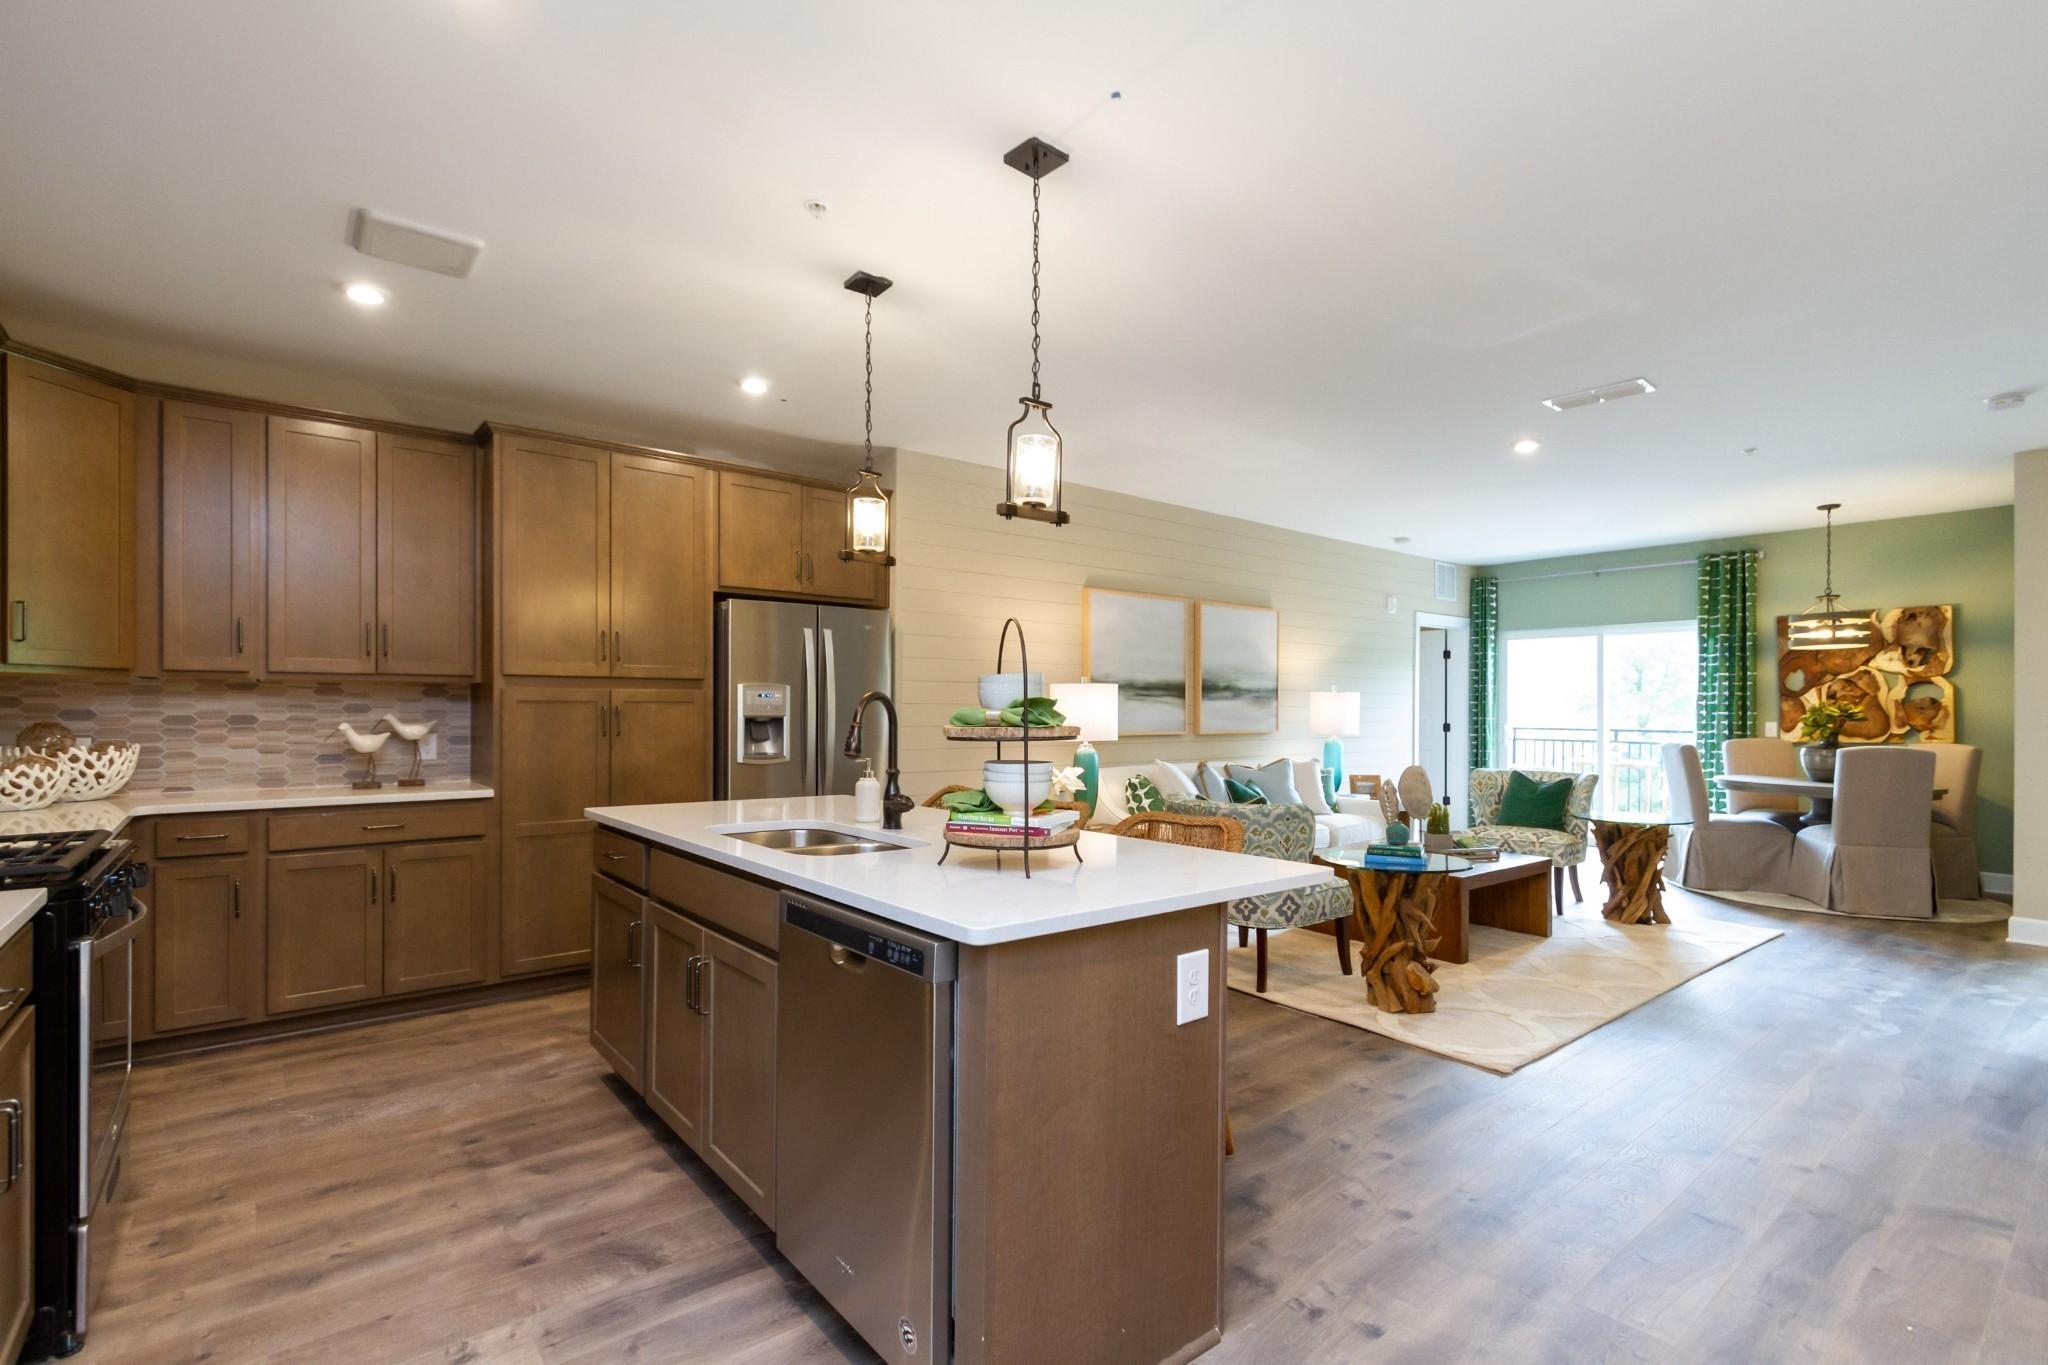 141 Saundersville Road #2204 Property Photo - Hendersonville, TN real estate listing